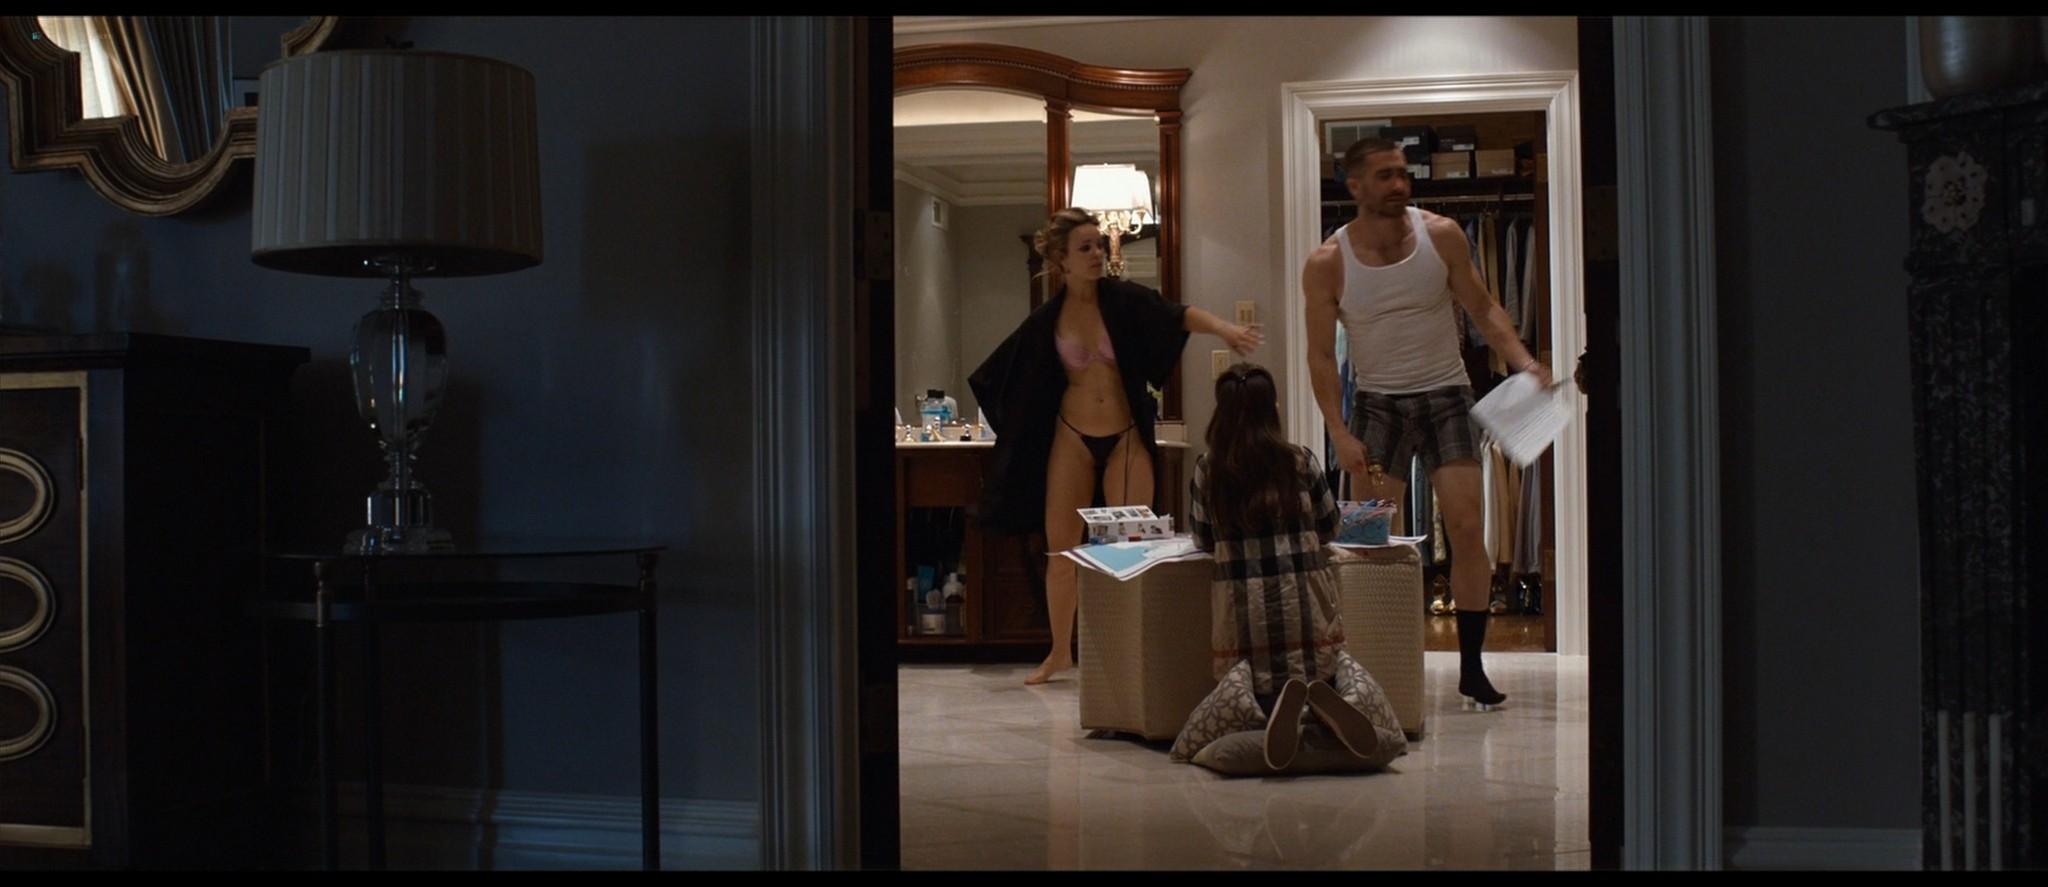 Rachel McAdams hot in panties and bra - Southpaw (2015) HD 1080p BluRay (3)